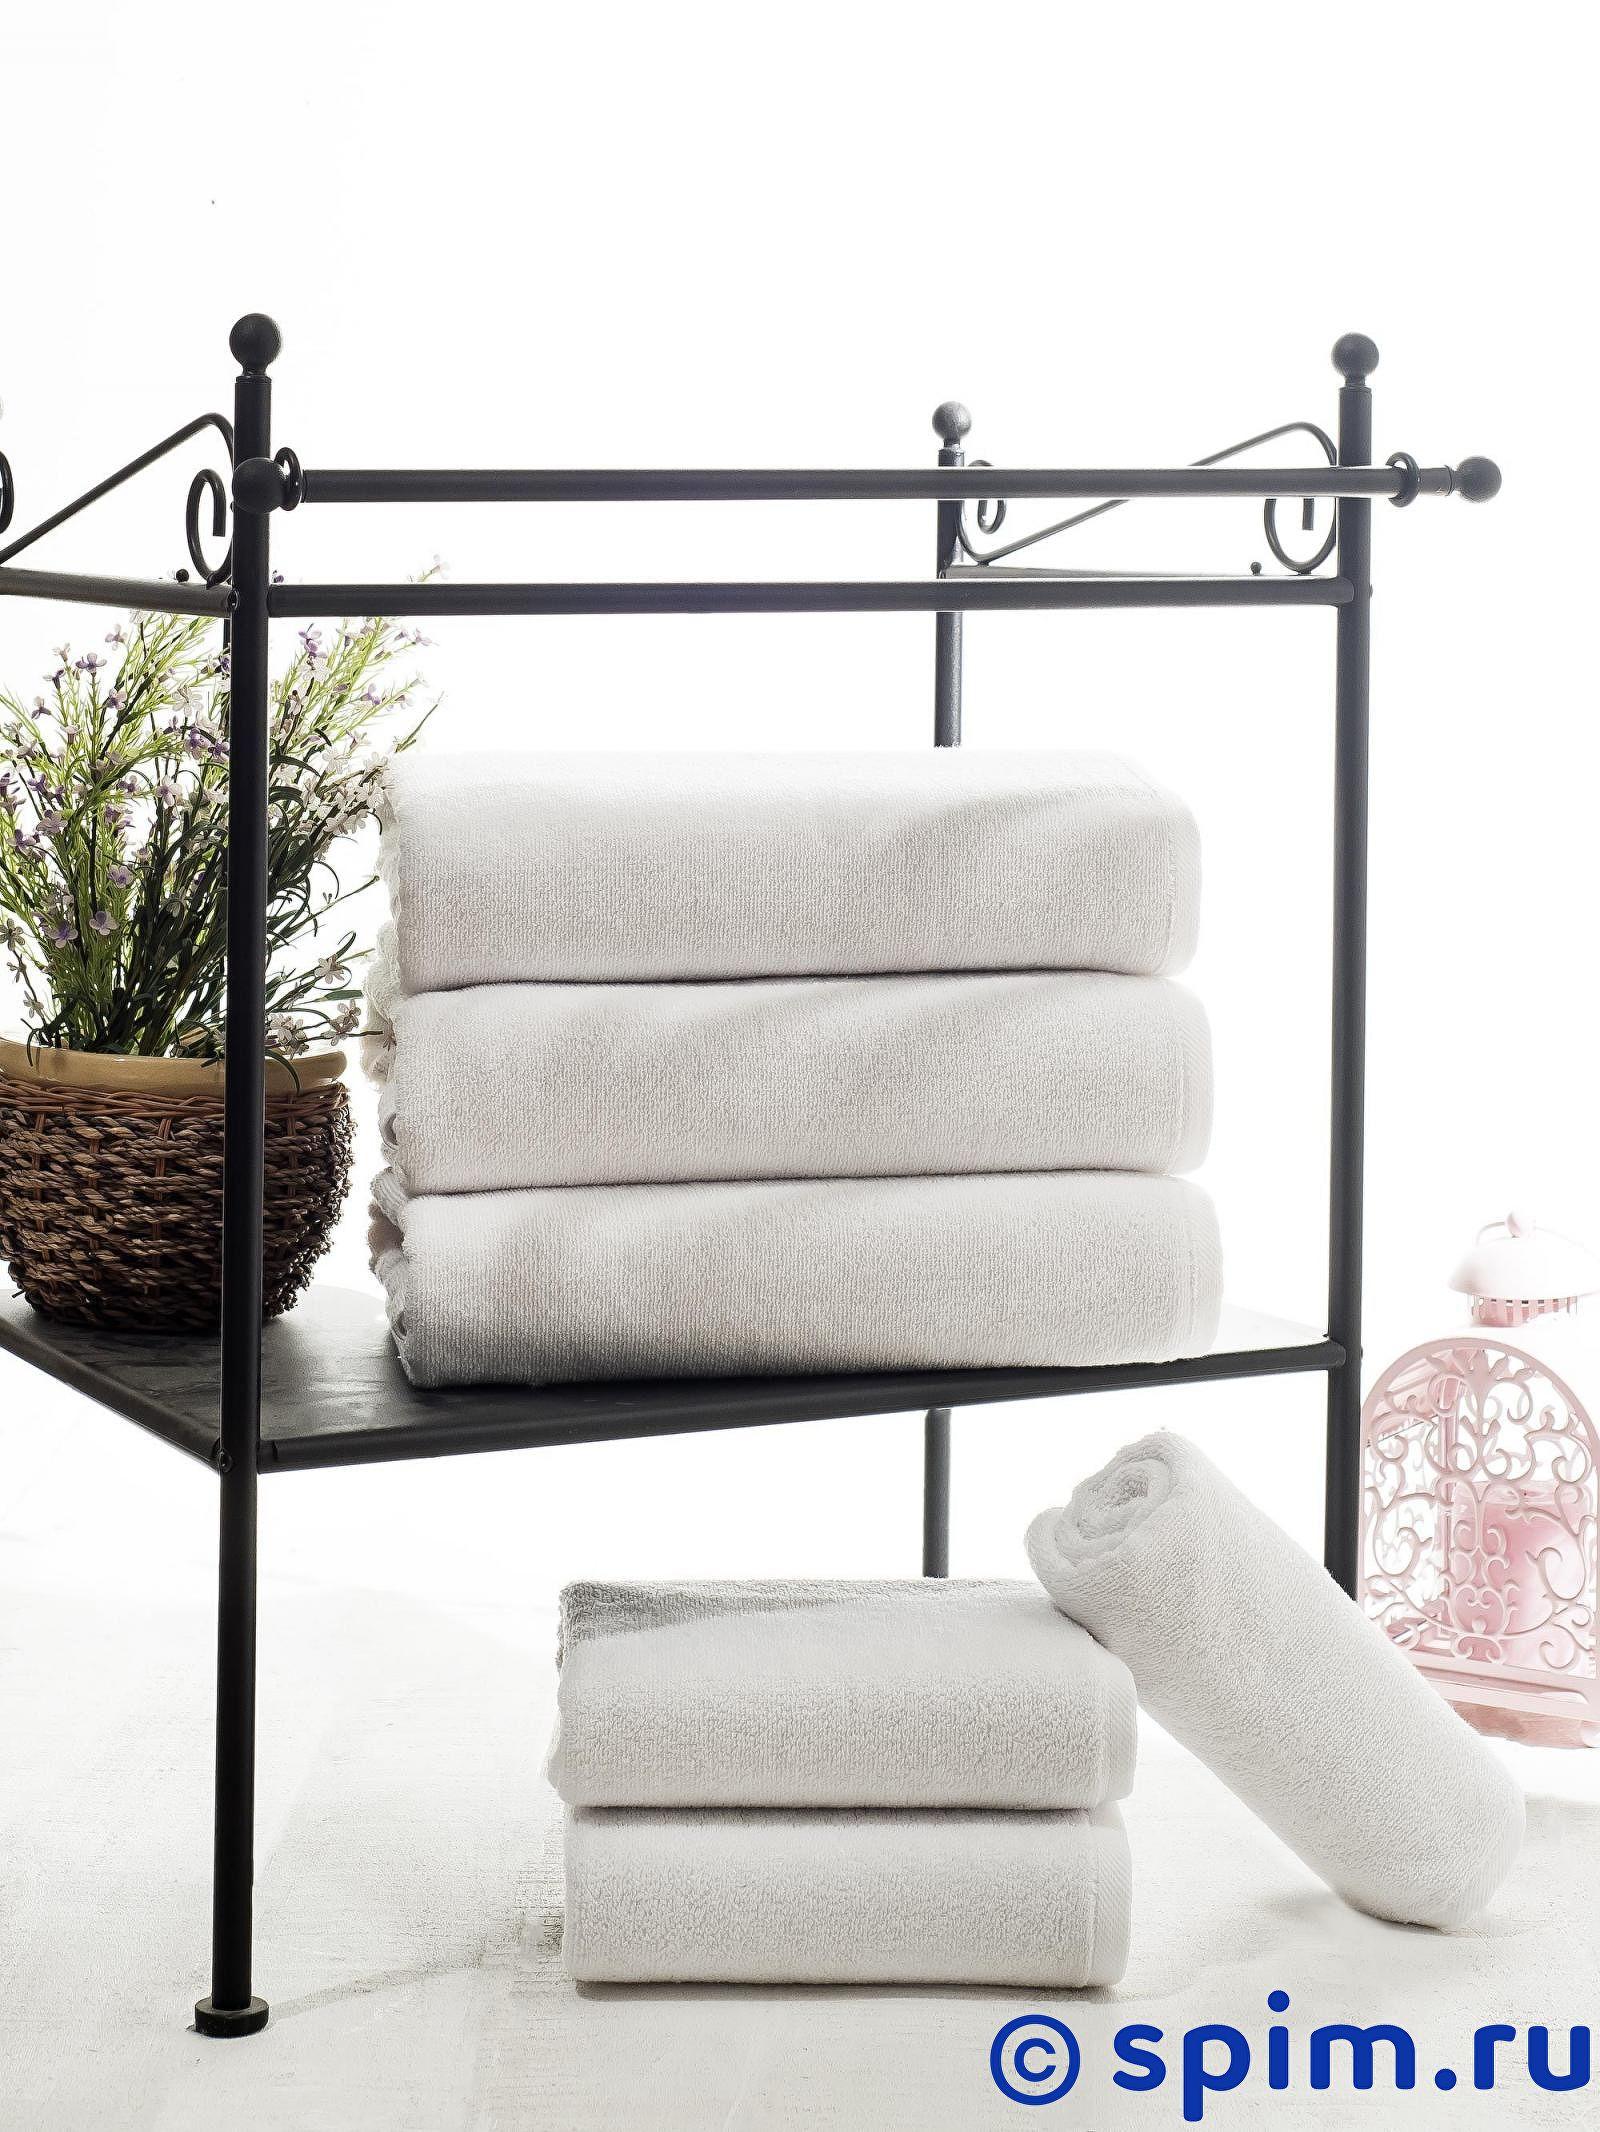 Набор из 12-ти полотенец Philippus для гостиницы 50х90 см 50х90 см полотенца philippus полотенце laura 50х90 см 6 шт